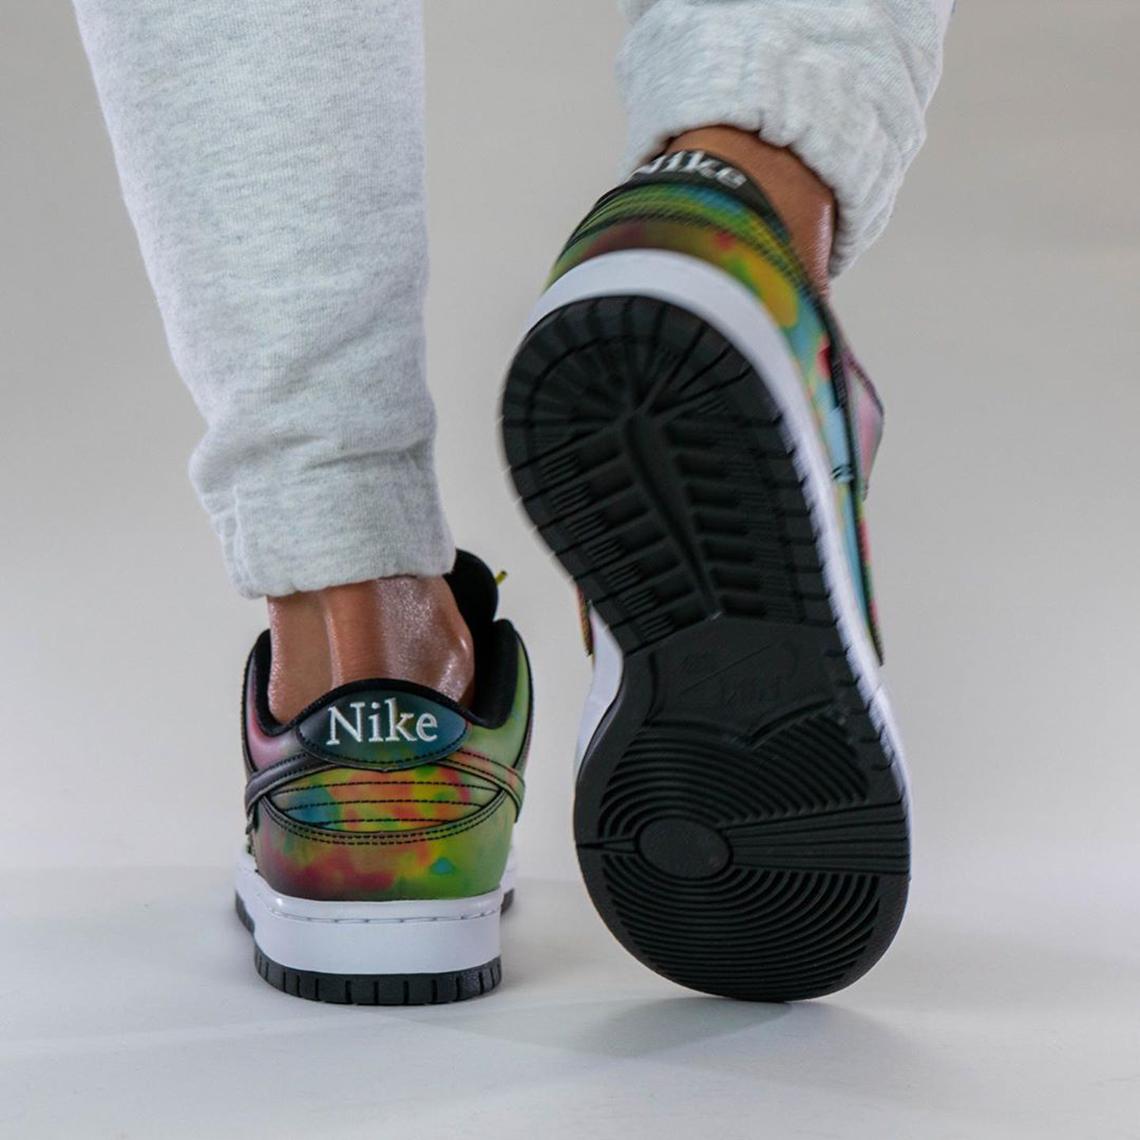 Civilist Nike SB Dunk Low CZ5123-001 Release Info | SneakerNews.com